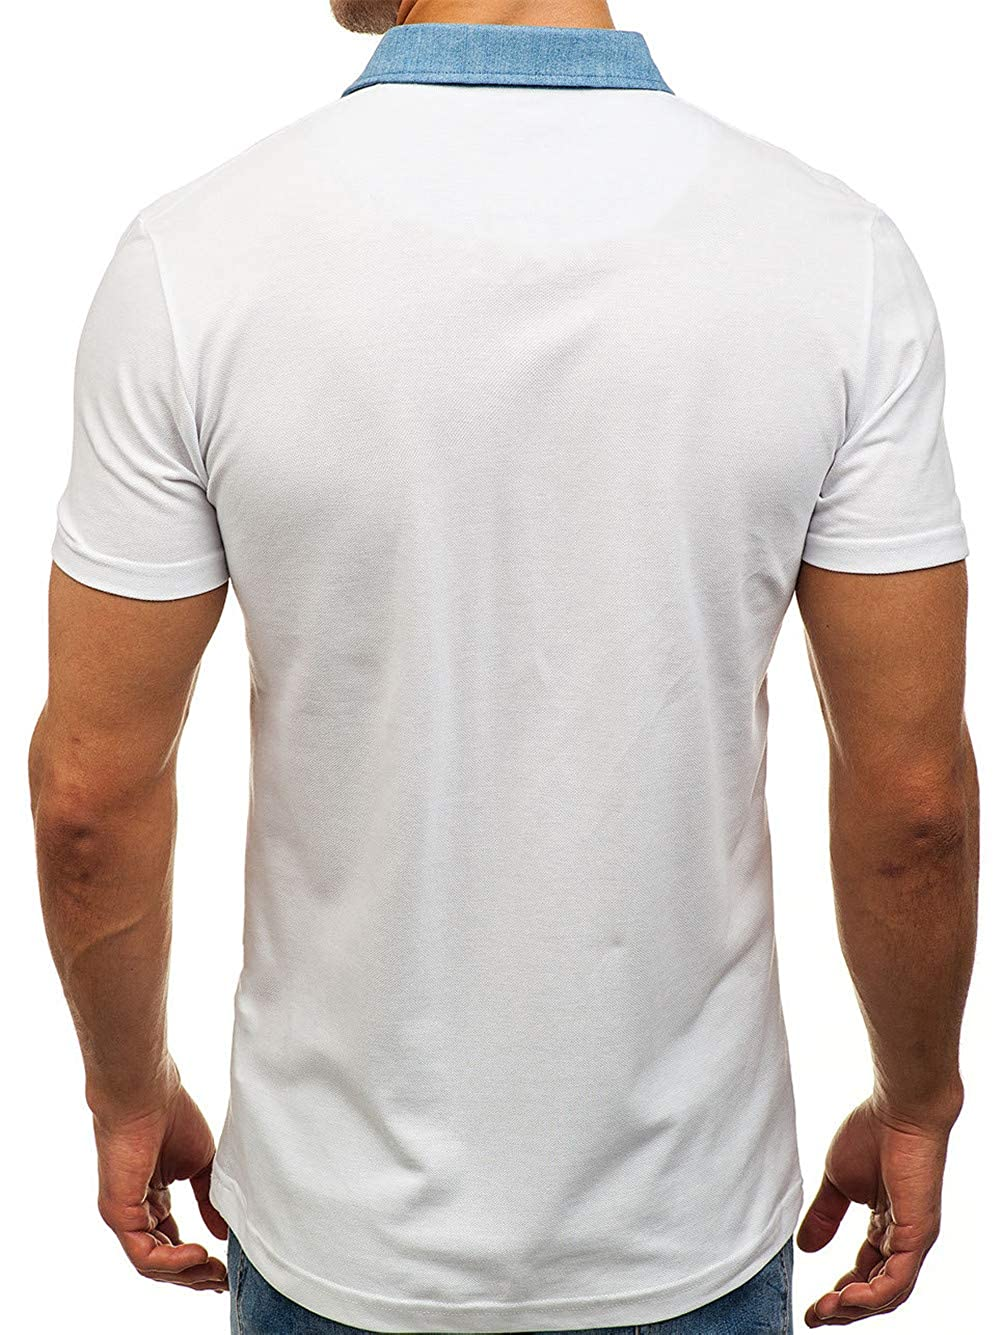 HWT8 Polo Shirt for Men Short-csfleeve Quick-csfry Casual Slim Fit Cotton